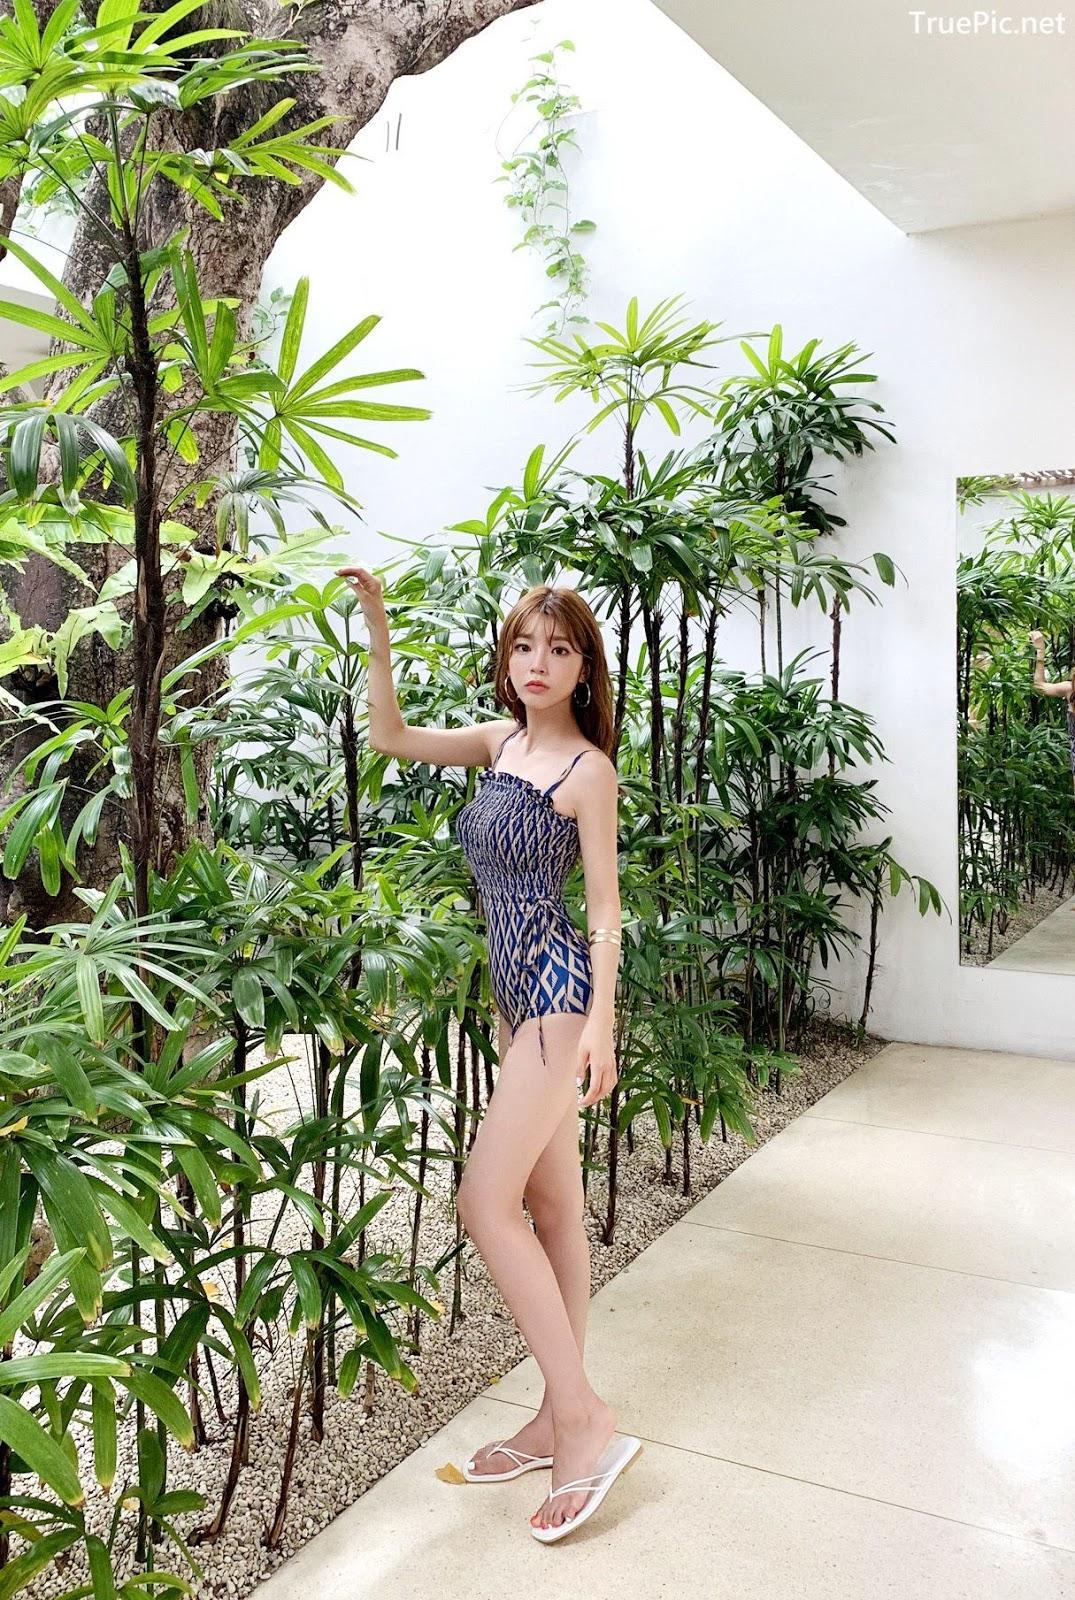 Image Korean Fashion Model - Cha Yoo Jin - Diamond Smoke Monokini - TruePic.net - Picture-8